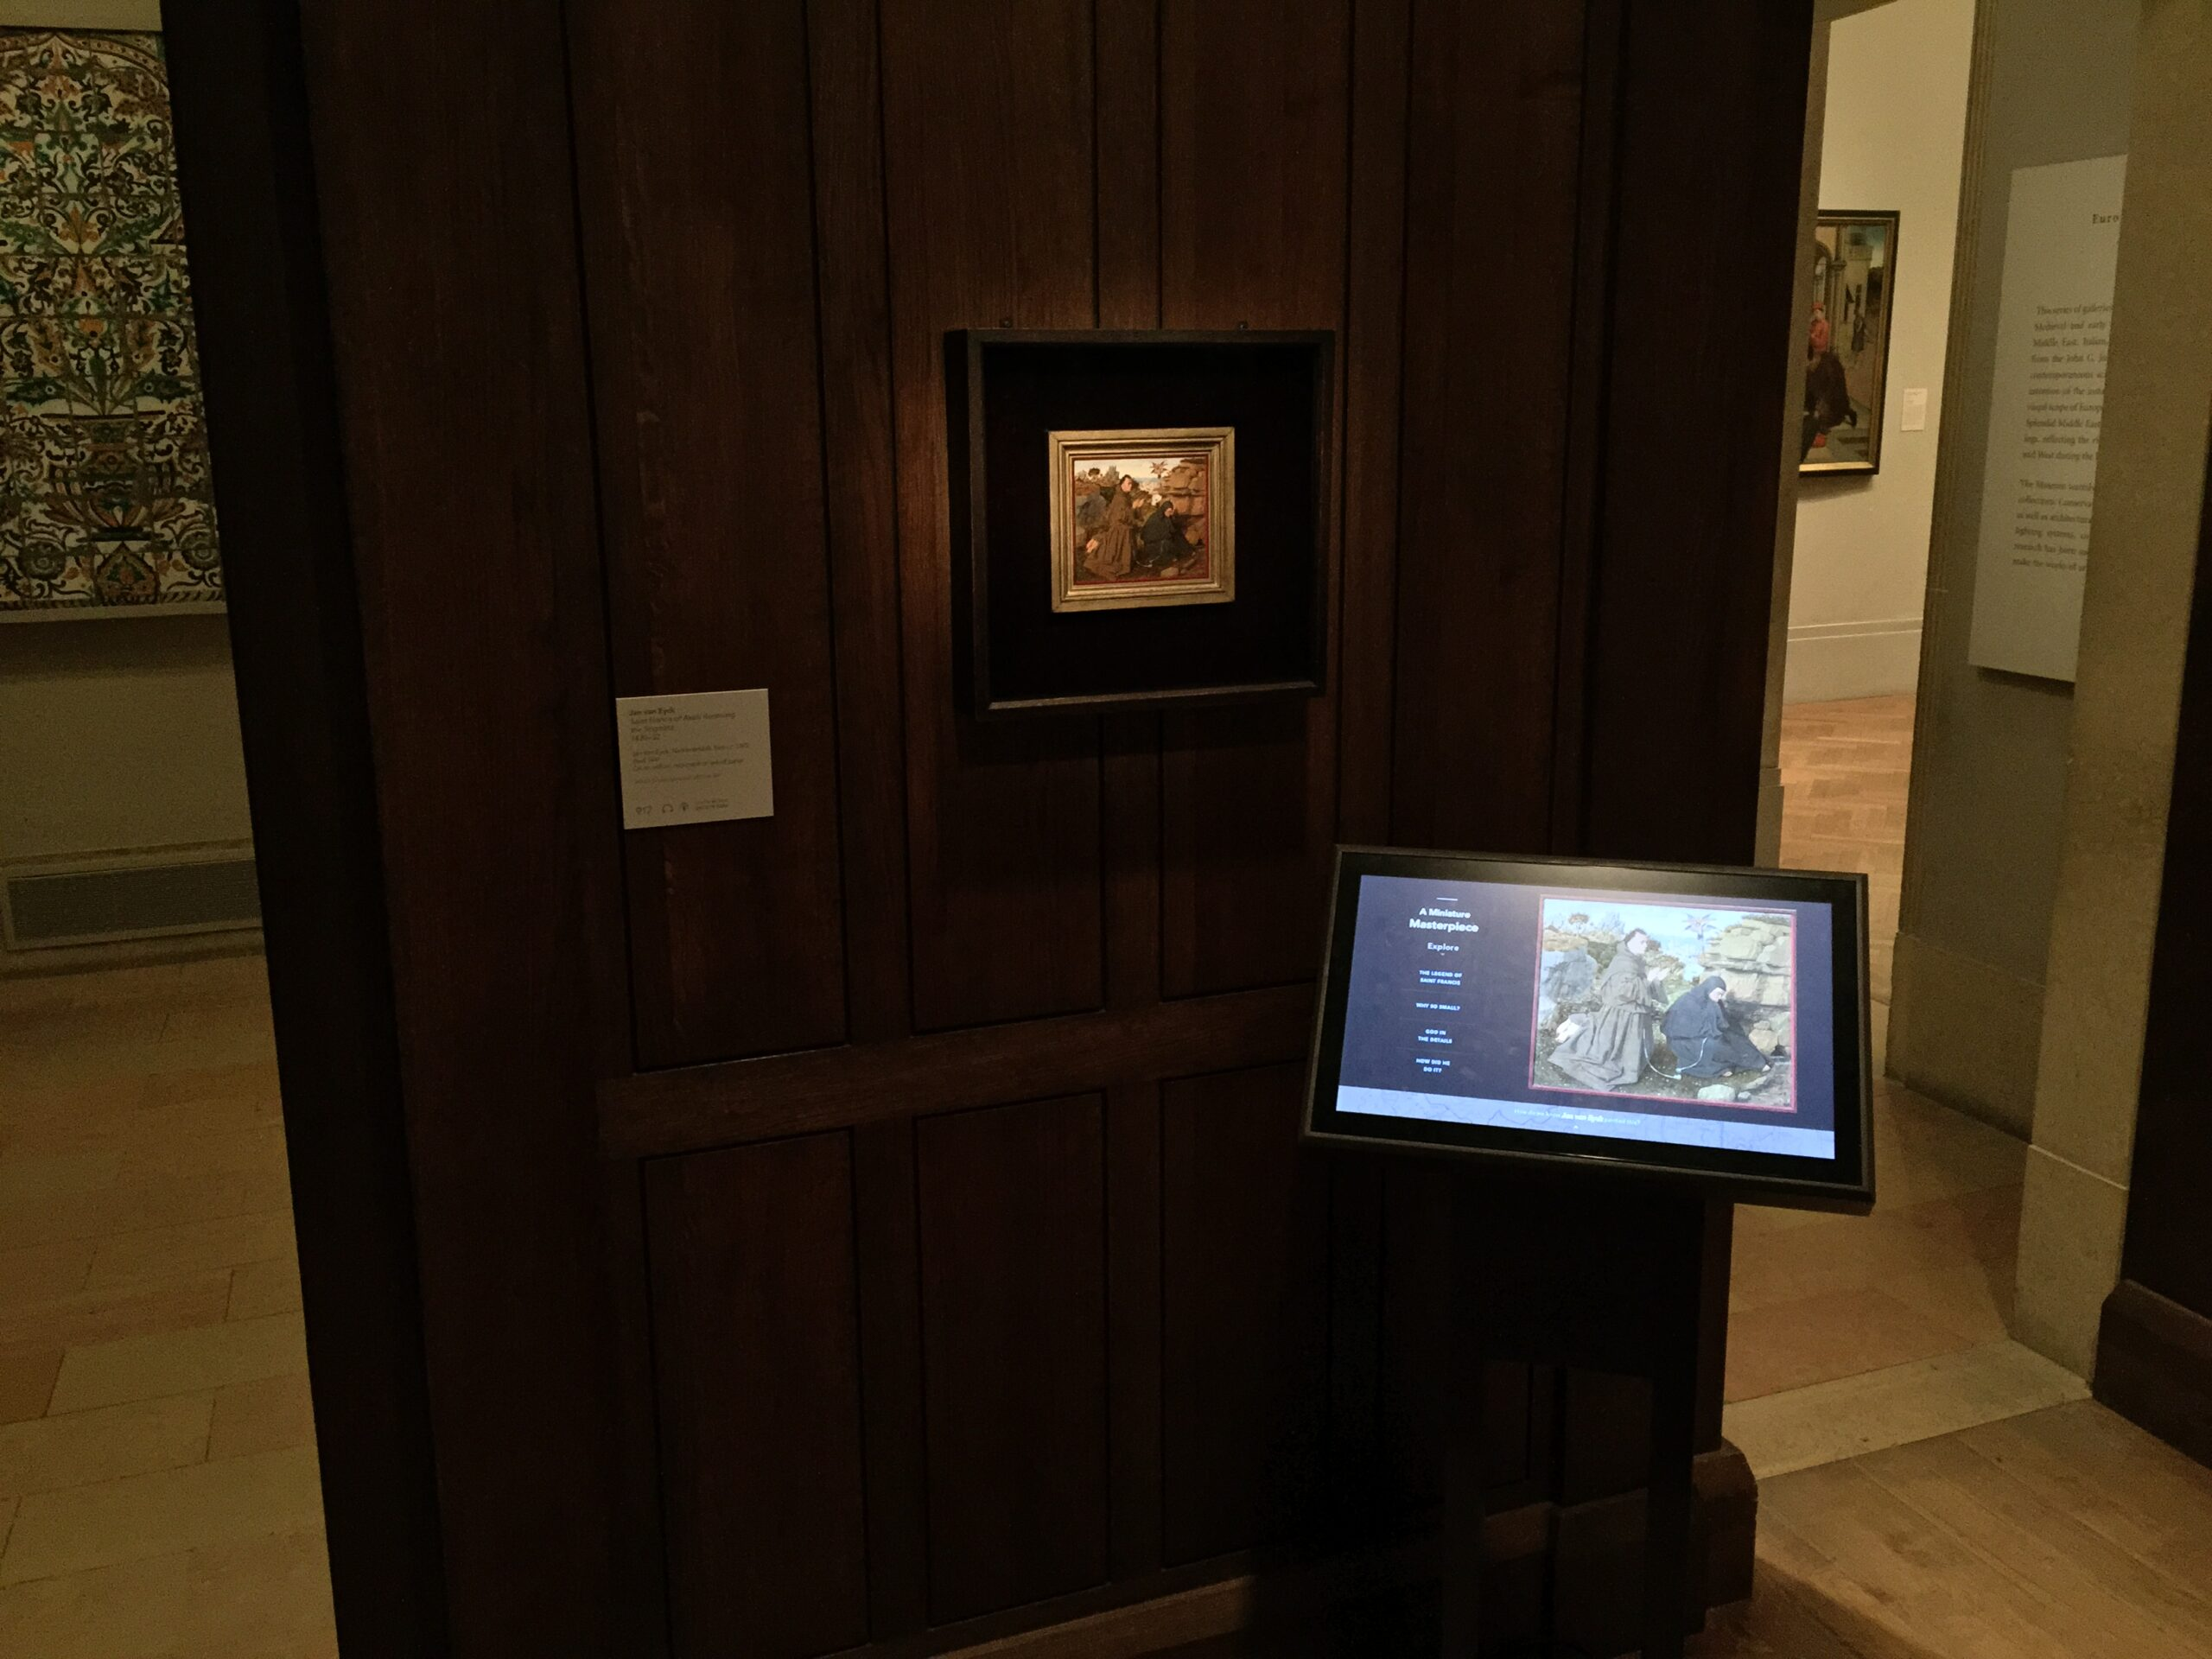 Fig. 5: Jan van Eyck's St. Francis Receiving the Stigmata in the gallery